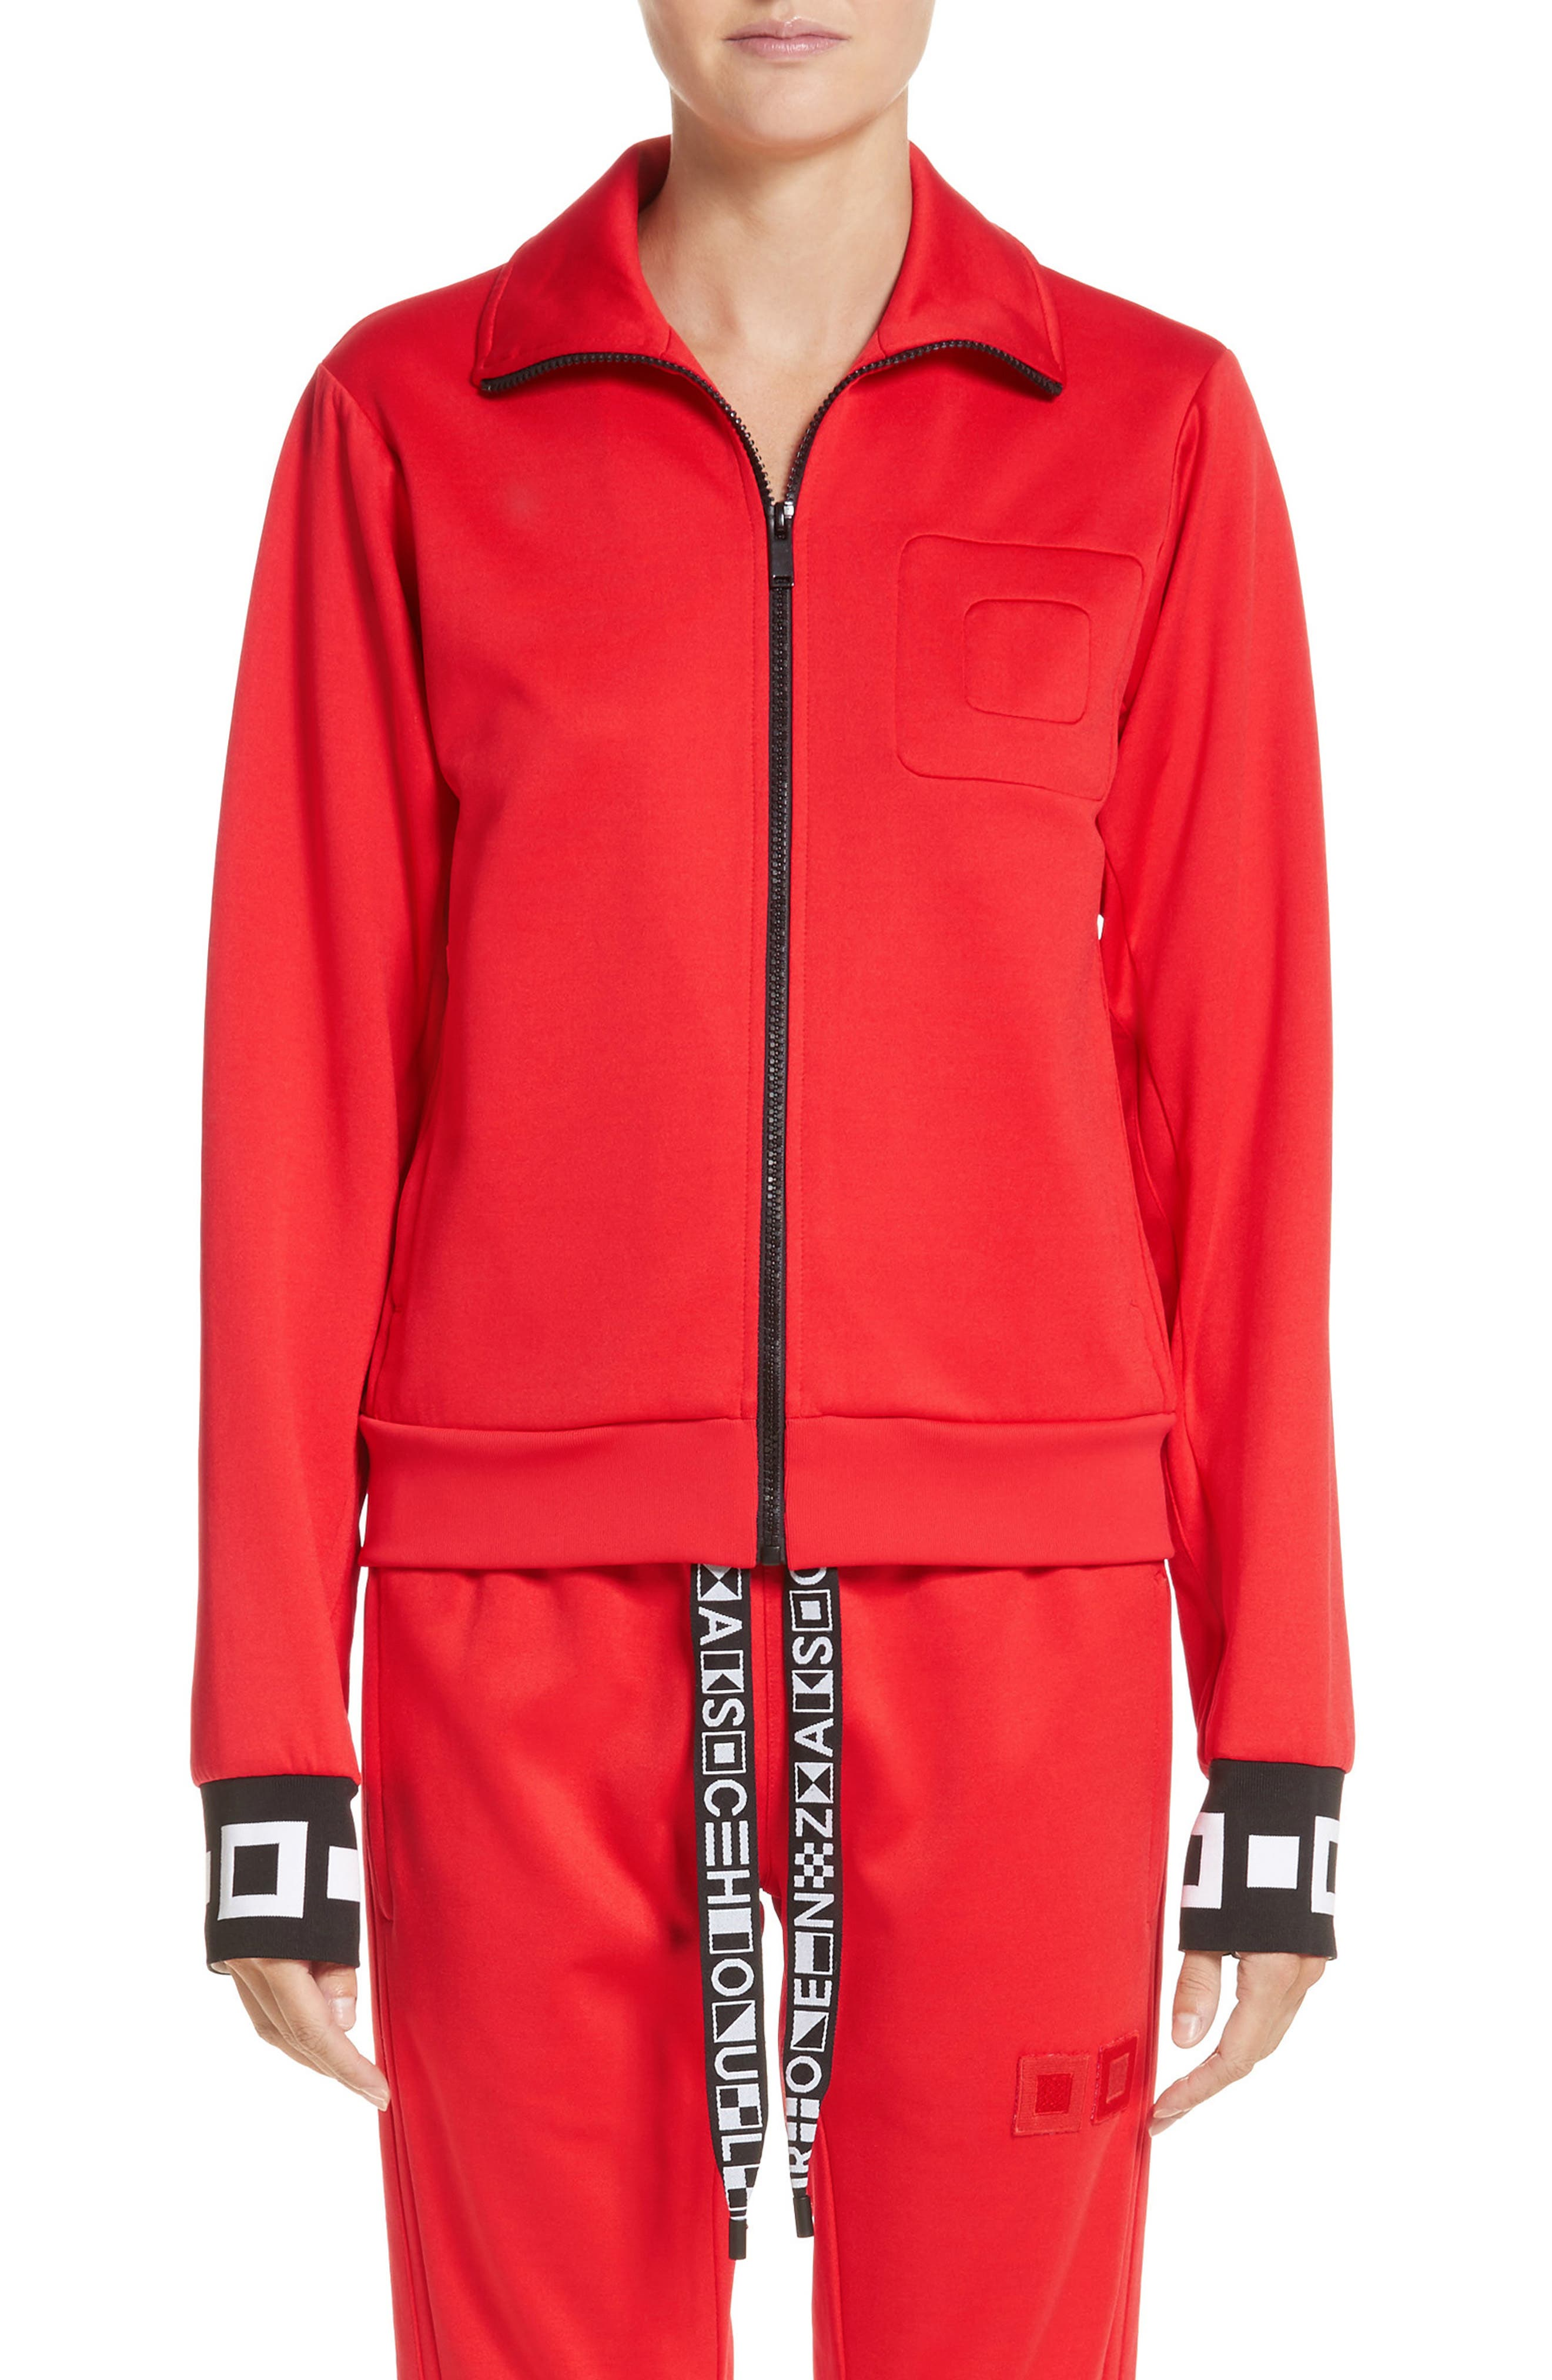 Main Image - Proenza Schouler PSWL Jersey Track Jacket